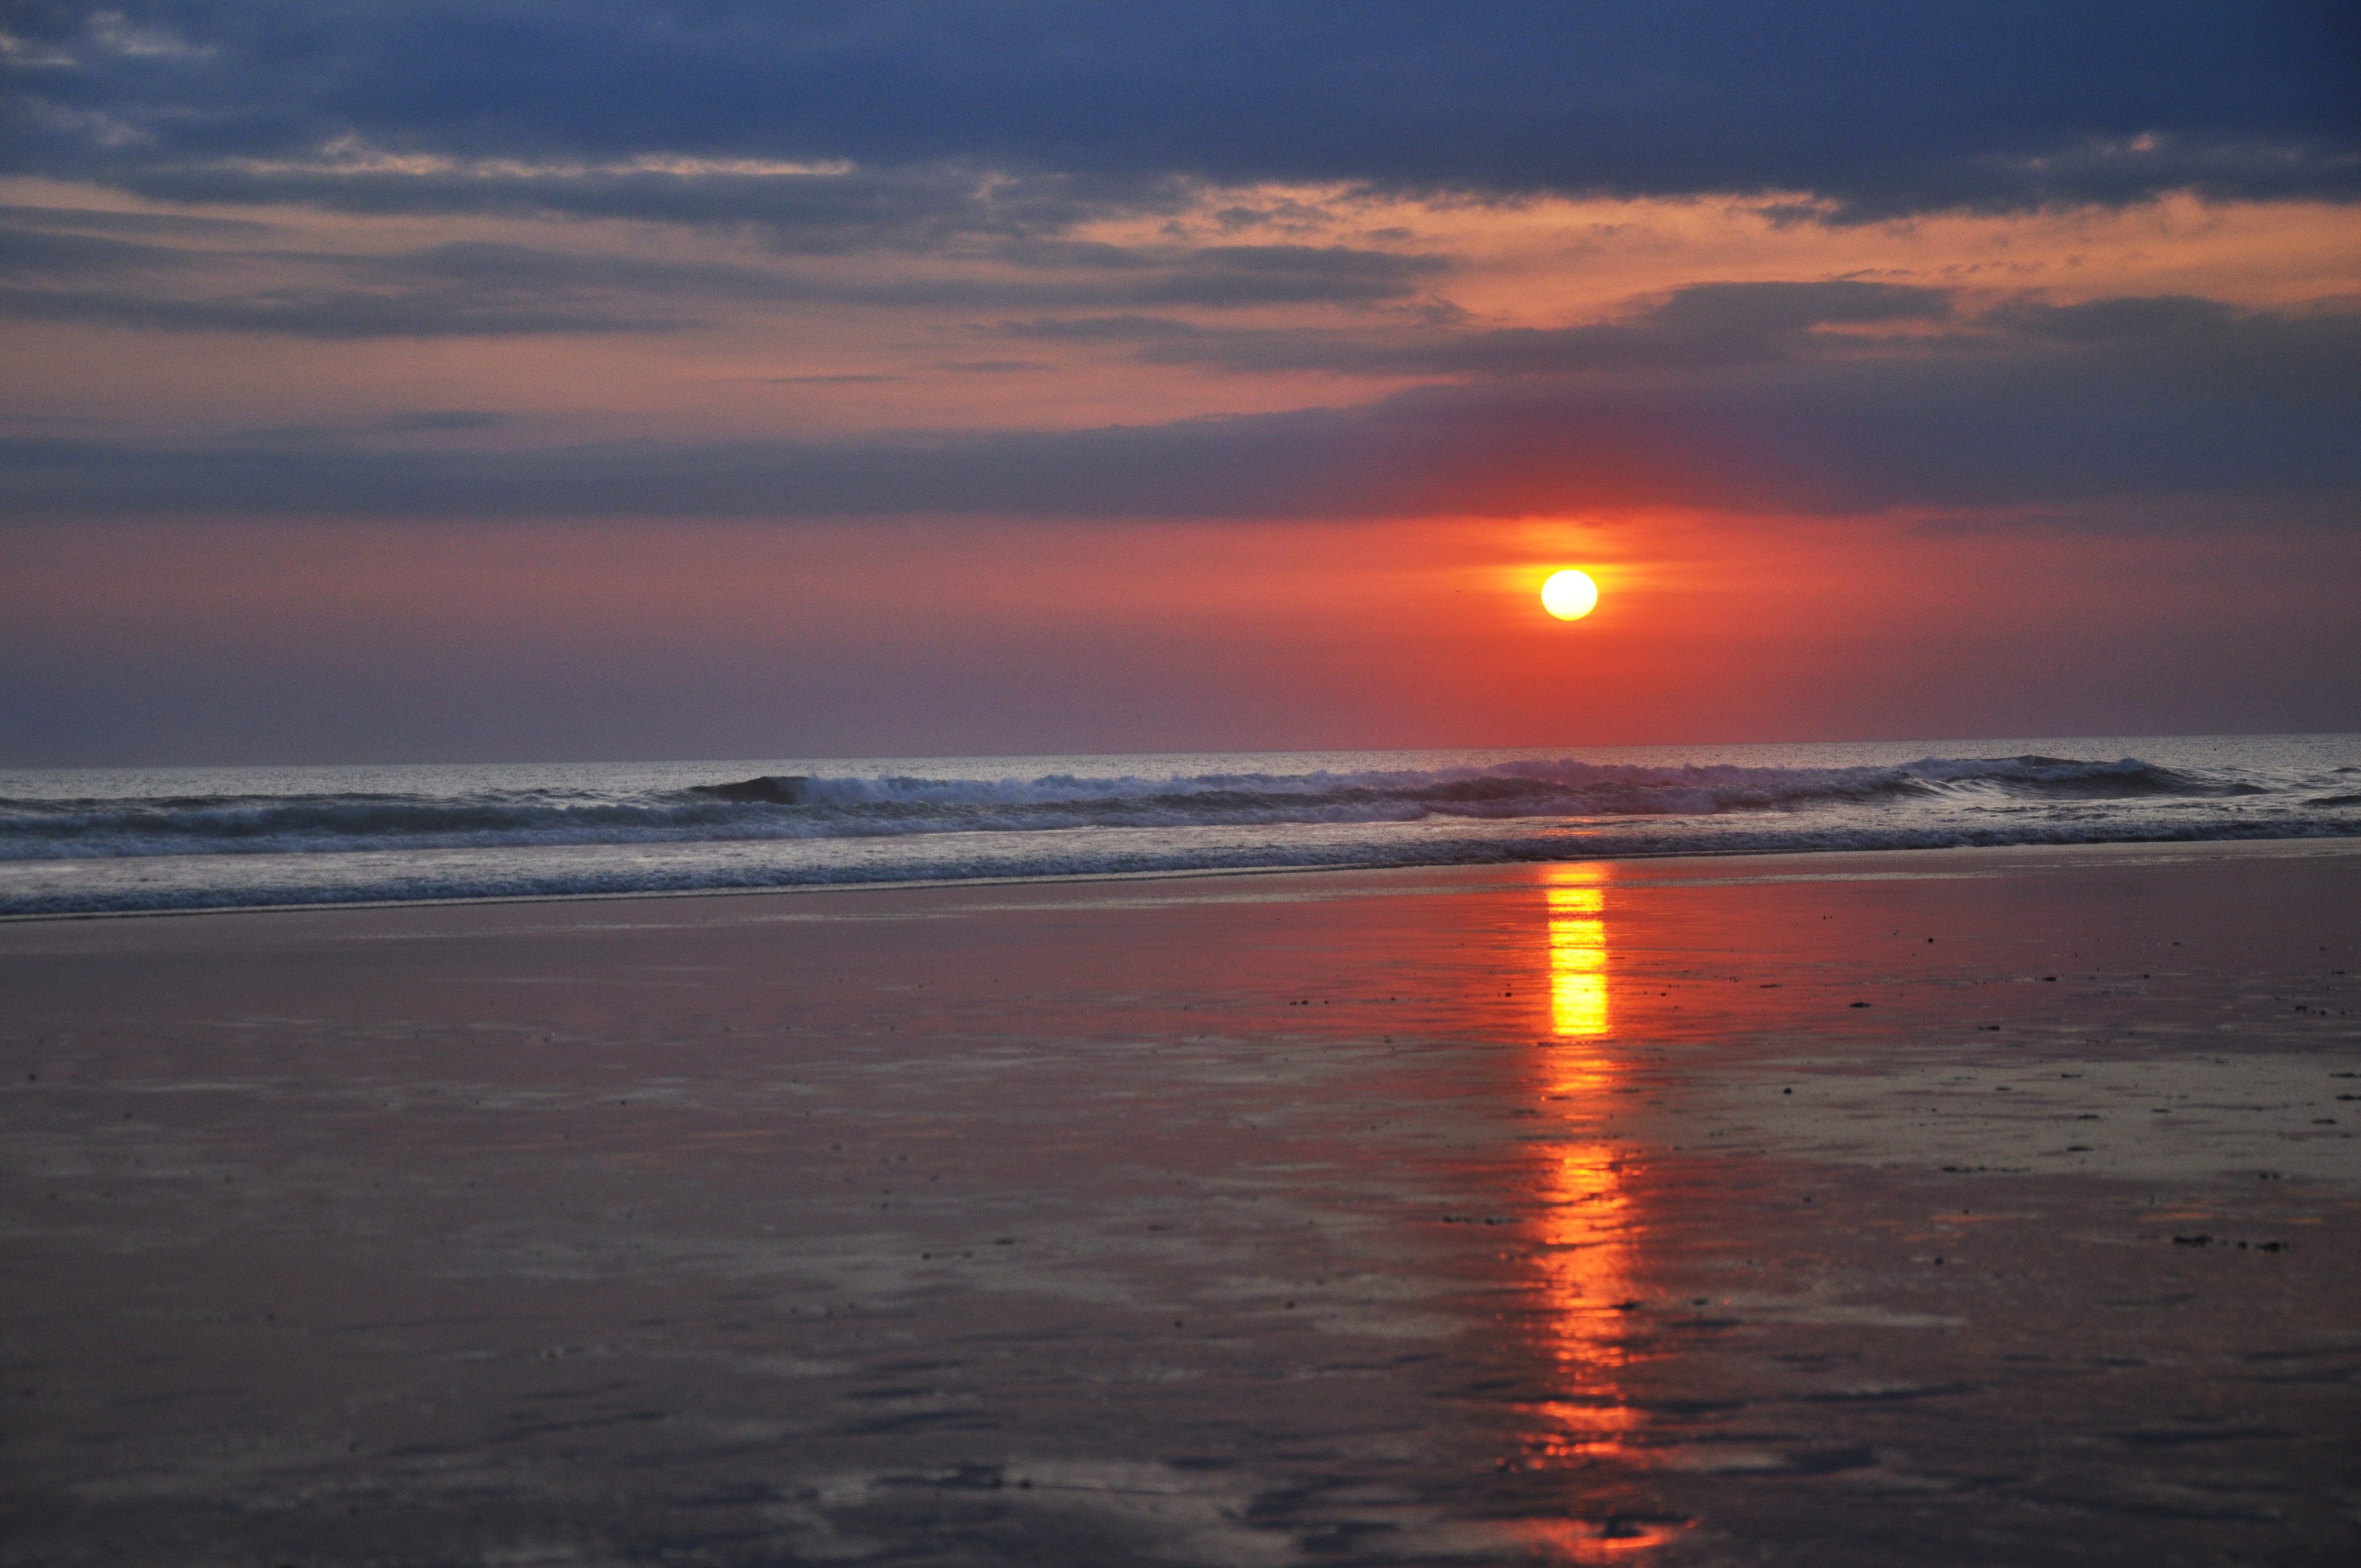 beach sunset morning 1574937357 - Beach Sunset Morning -